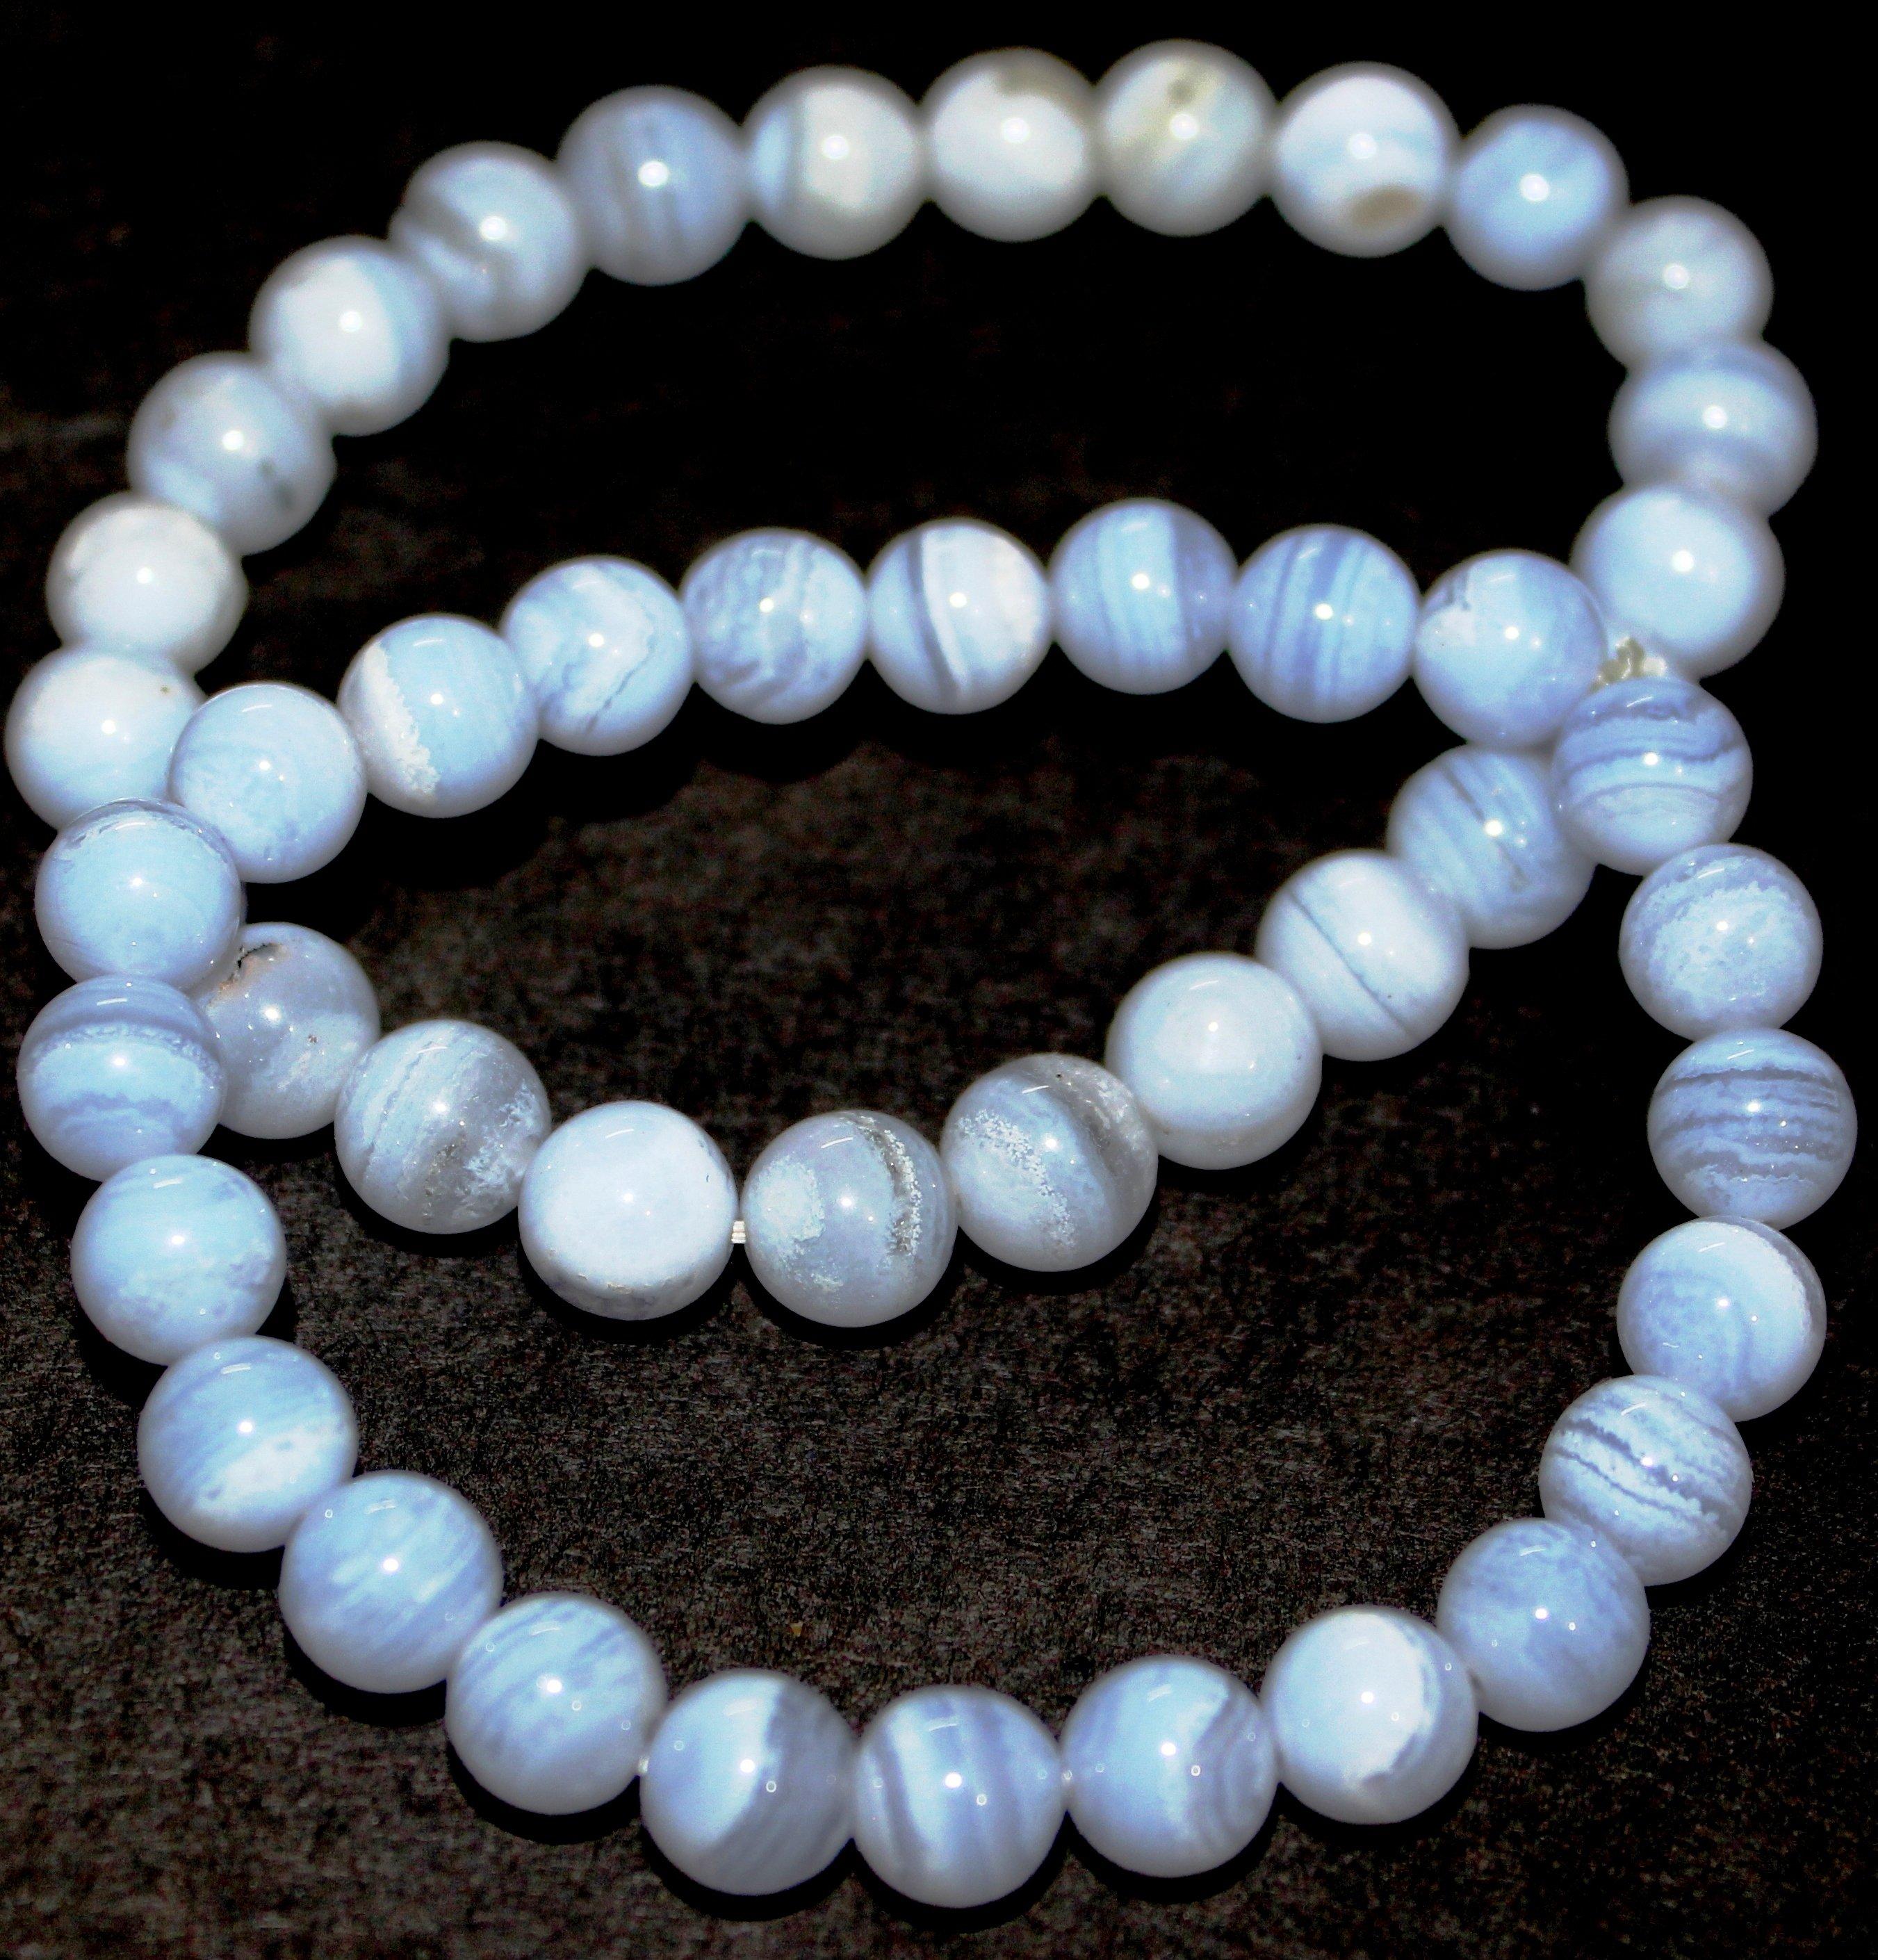 Blue Lace Agate Crystal Bracelet for Unisex 00001BLAB